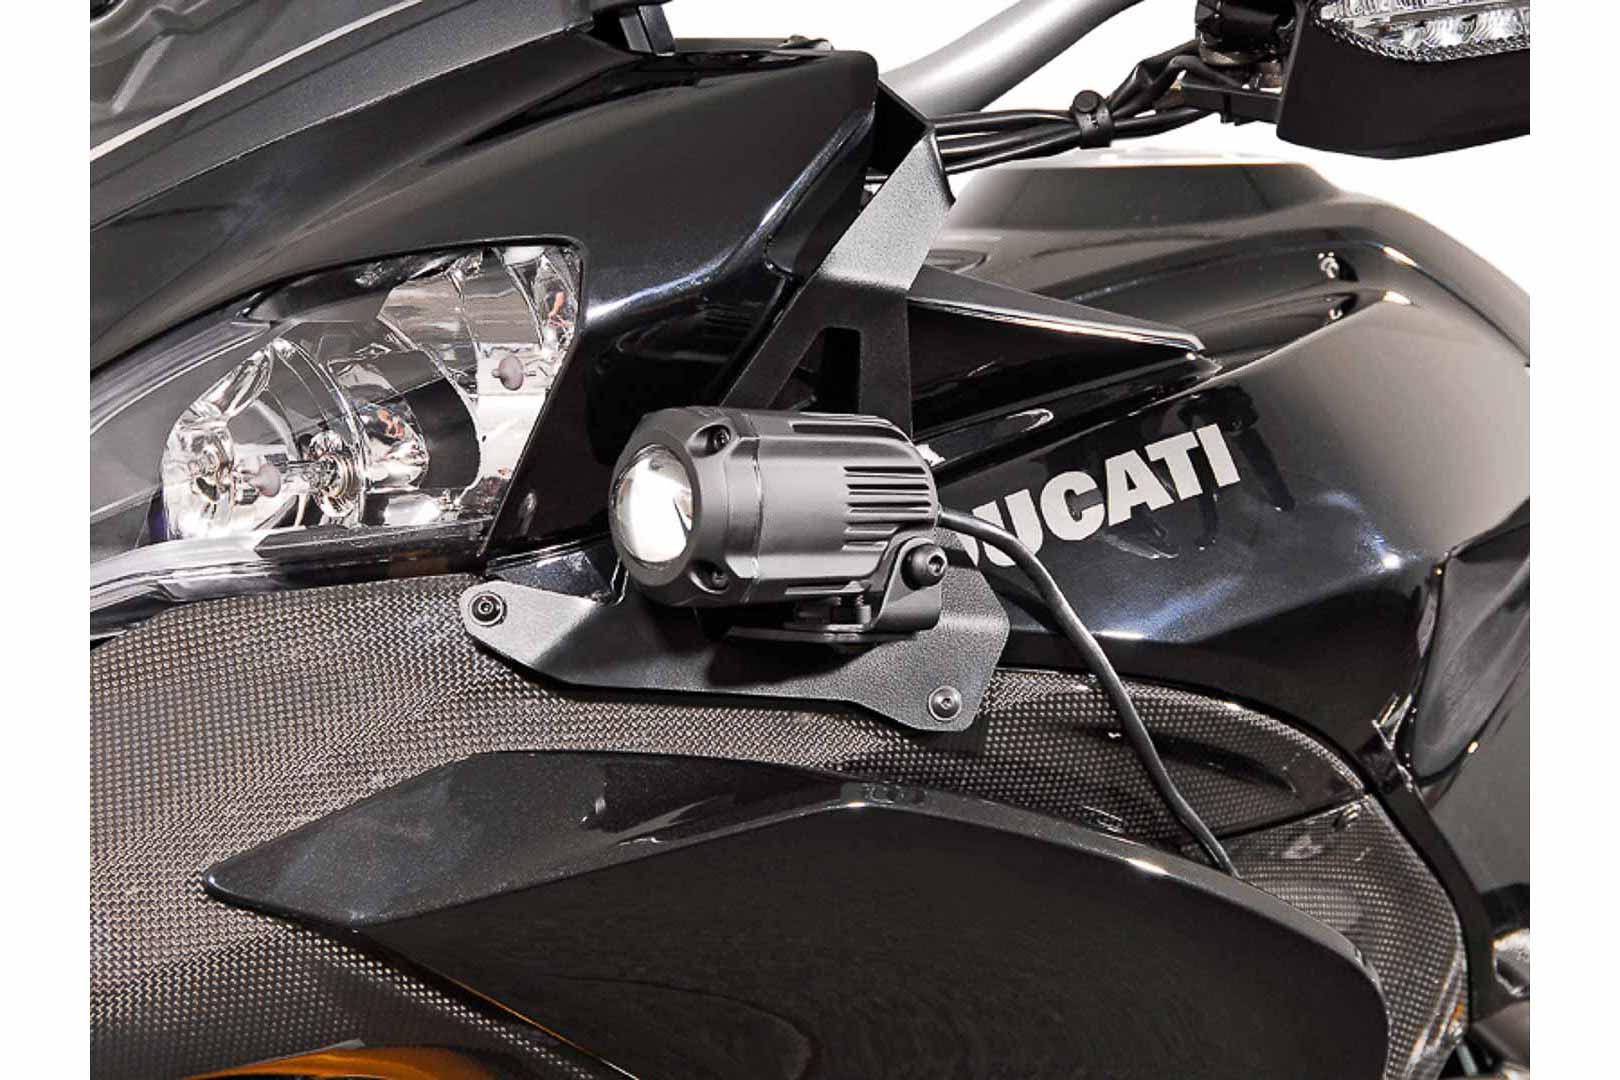 SW-Motech HAWK-lisävalosarjan kiinnike, Ducati Multistrada 1200 10-